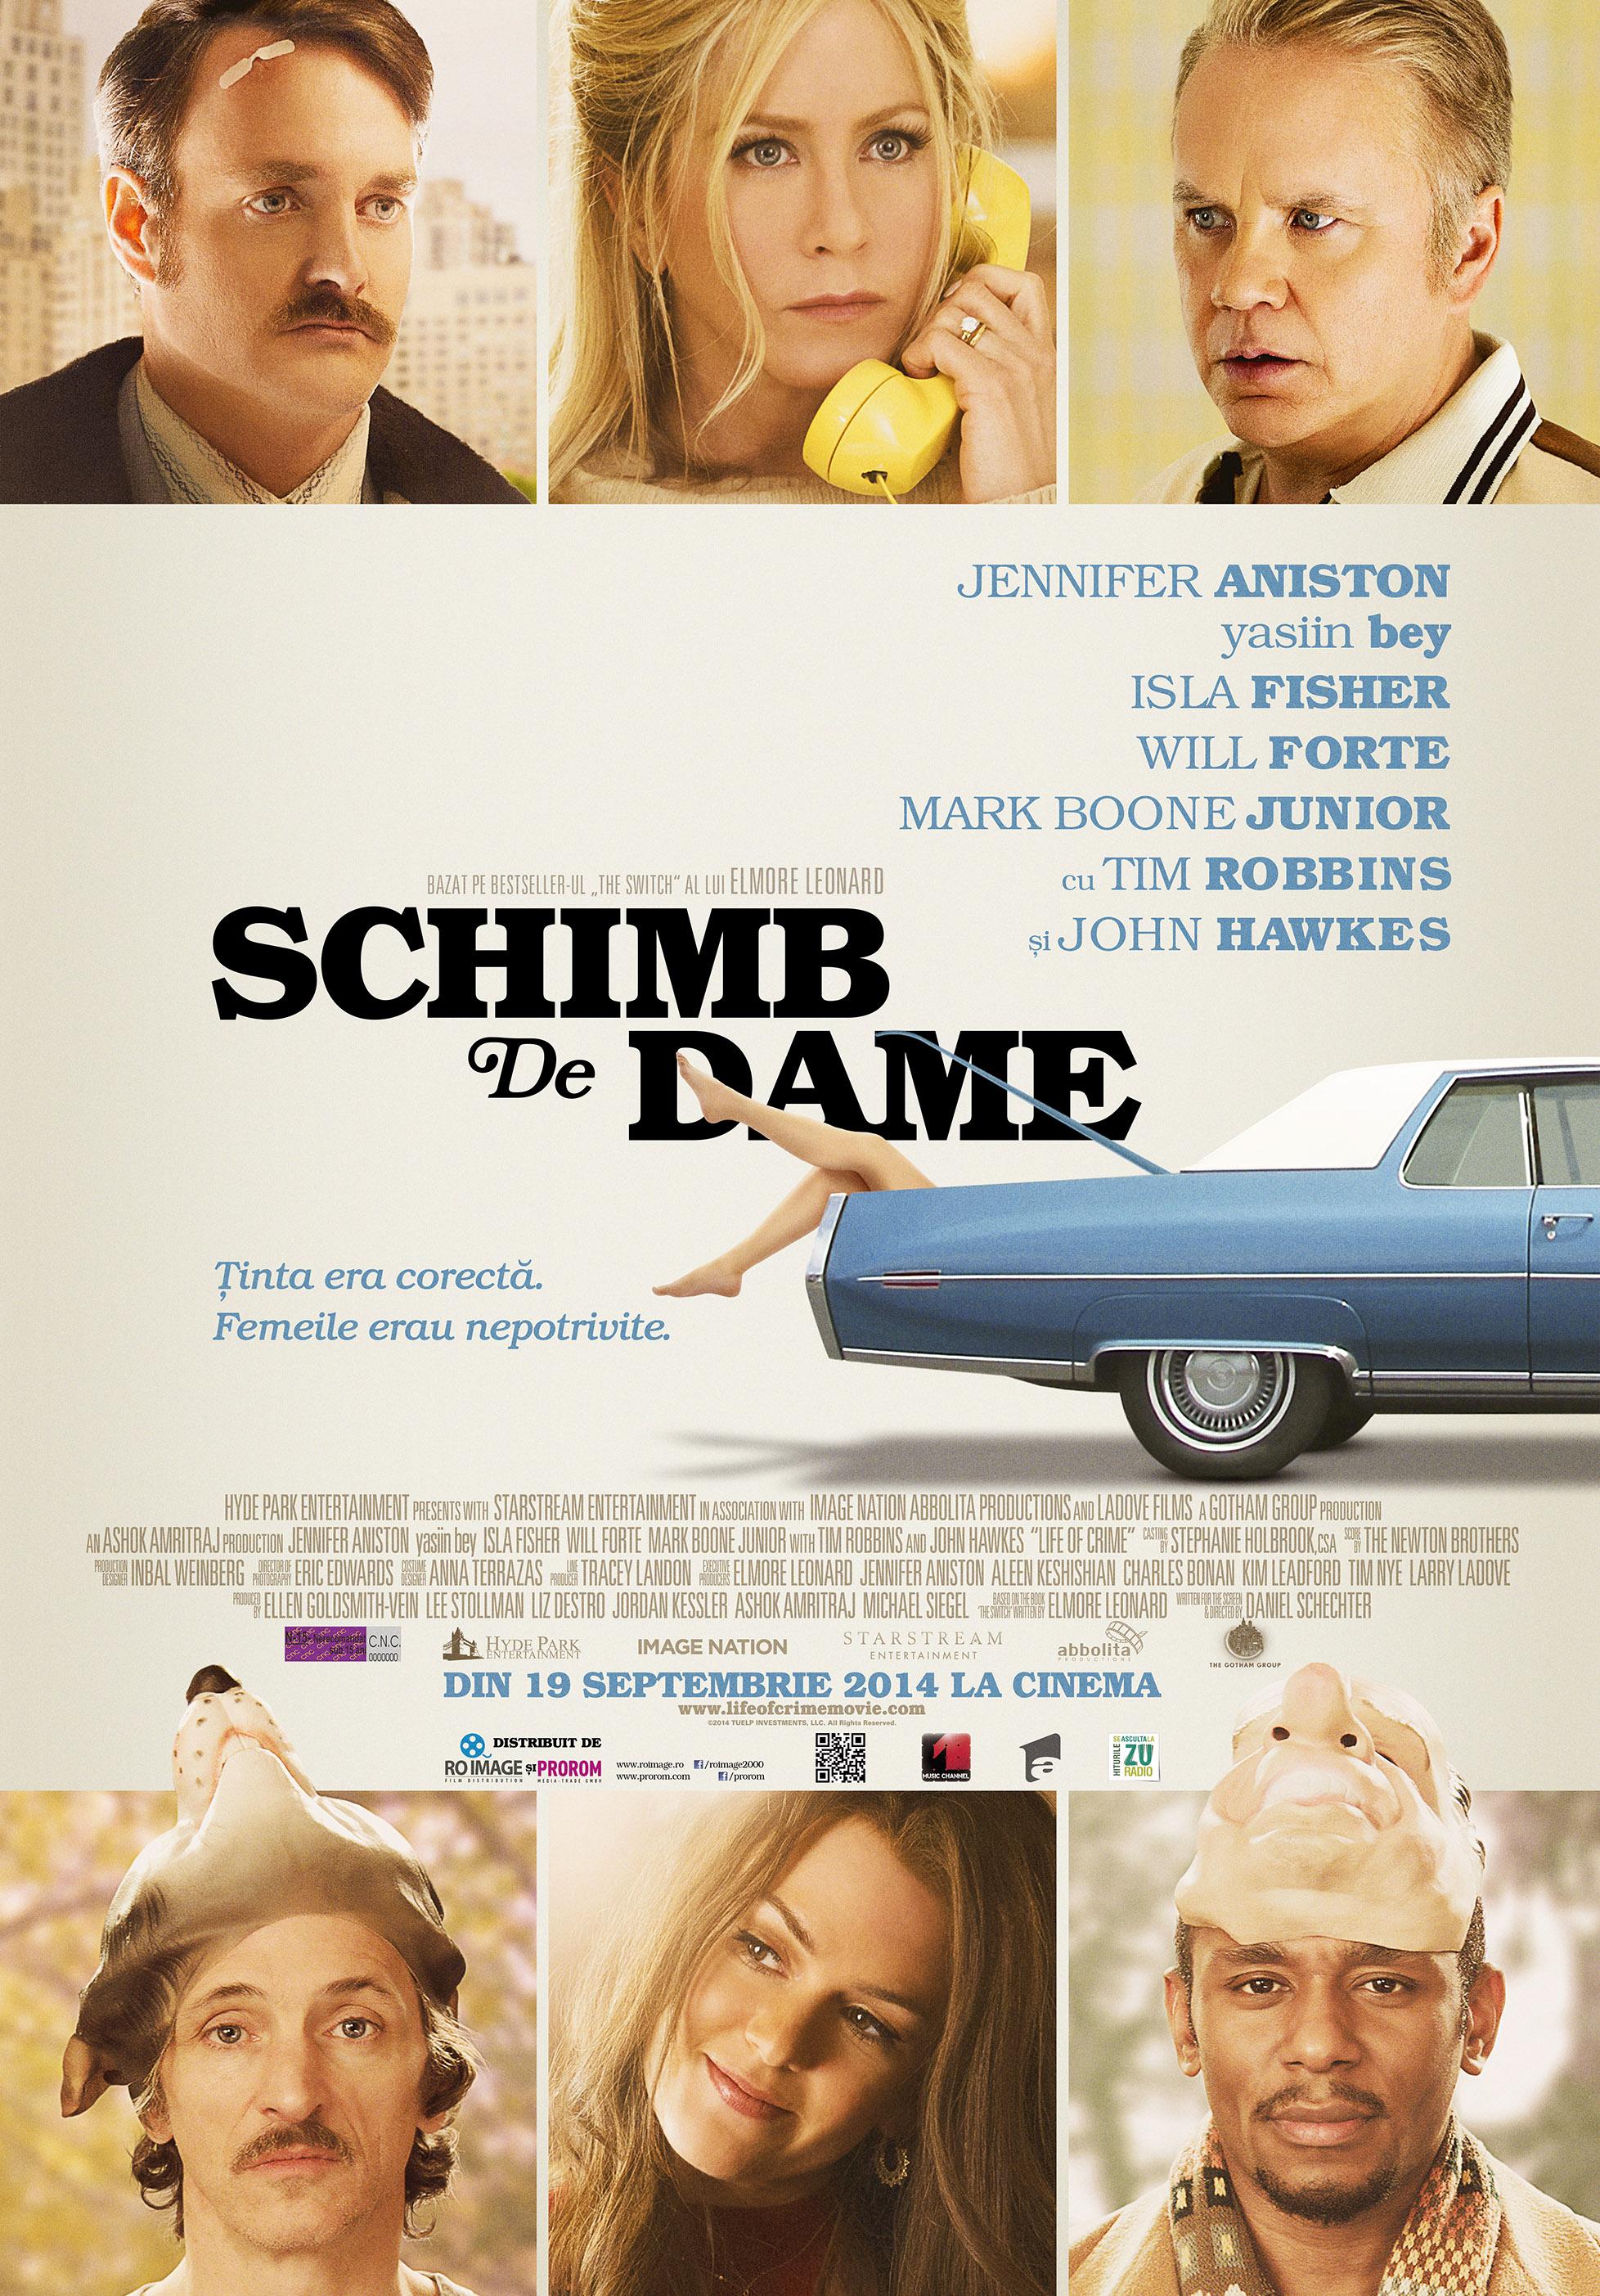 Schimb de dame / Life of Crime (Premiera)